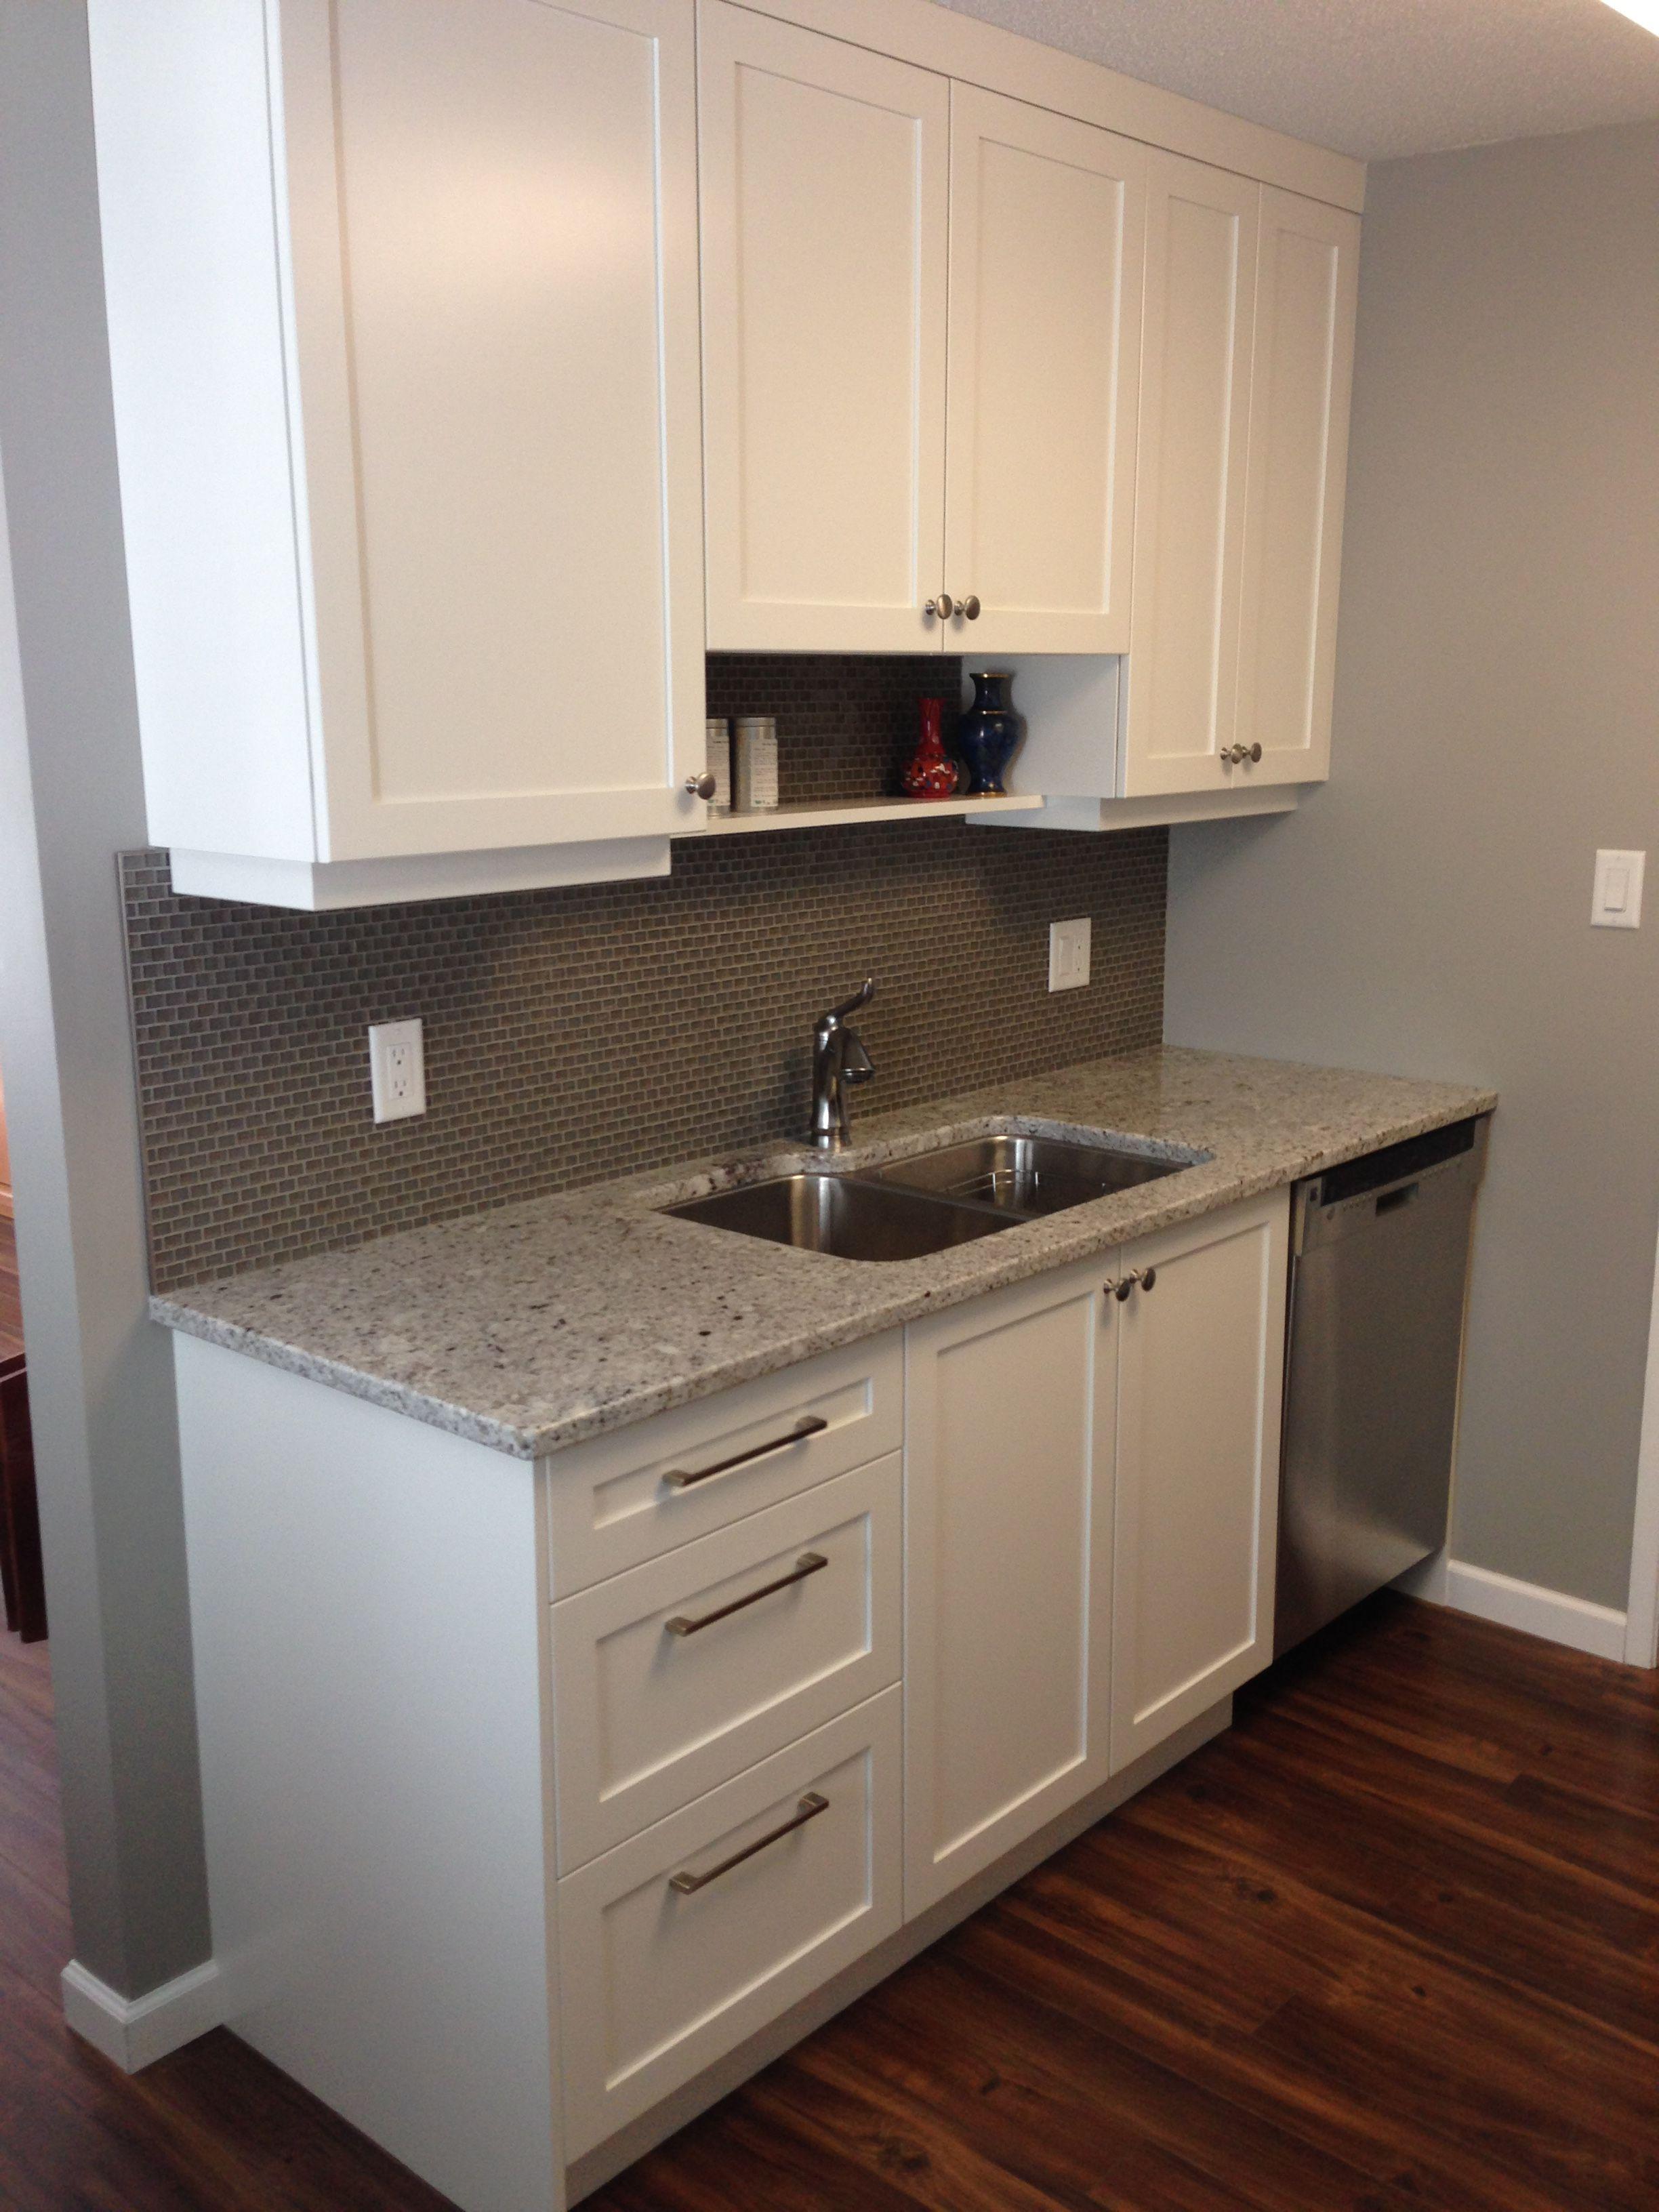 Cabinets white shaker style countertop andino granite backsplash grey kenai also